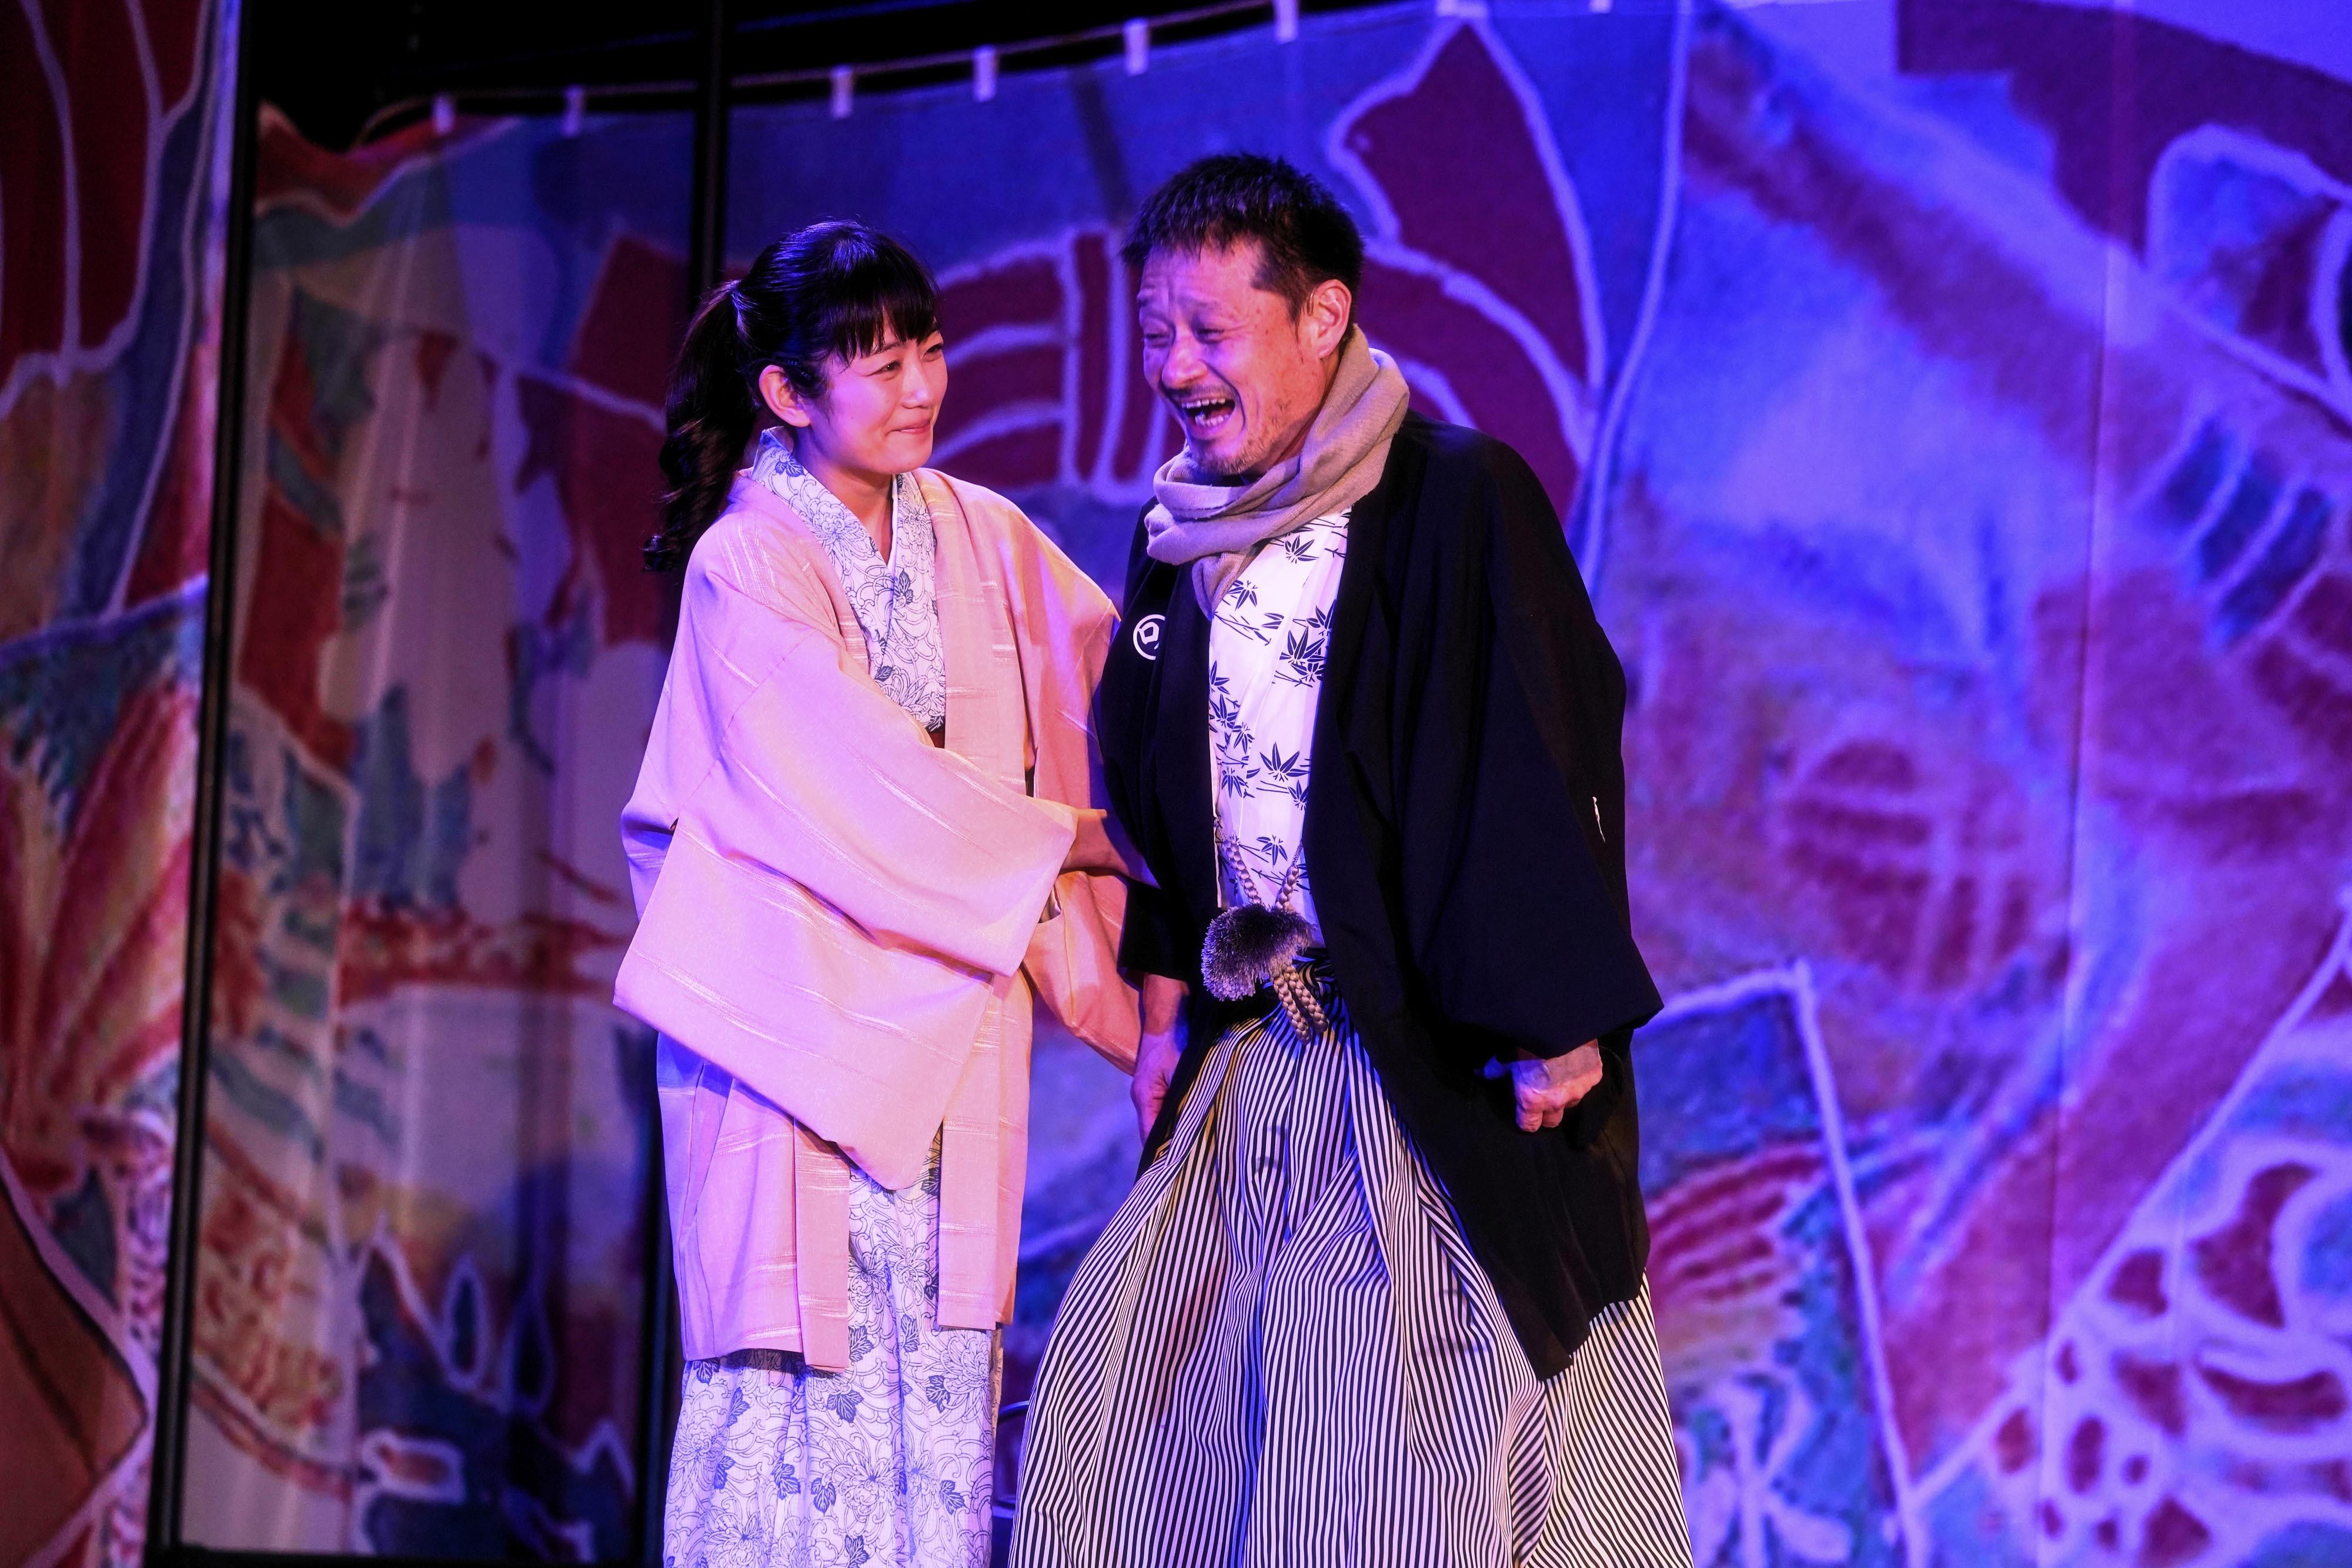 (左から) 森田涼花、福田転球 撮影:細野晋司